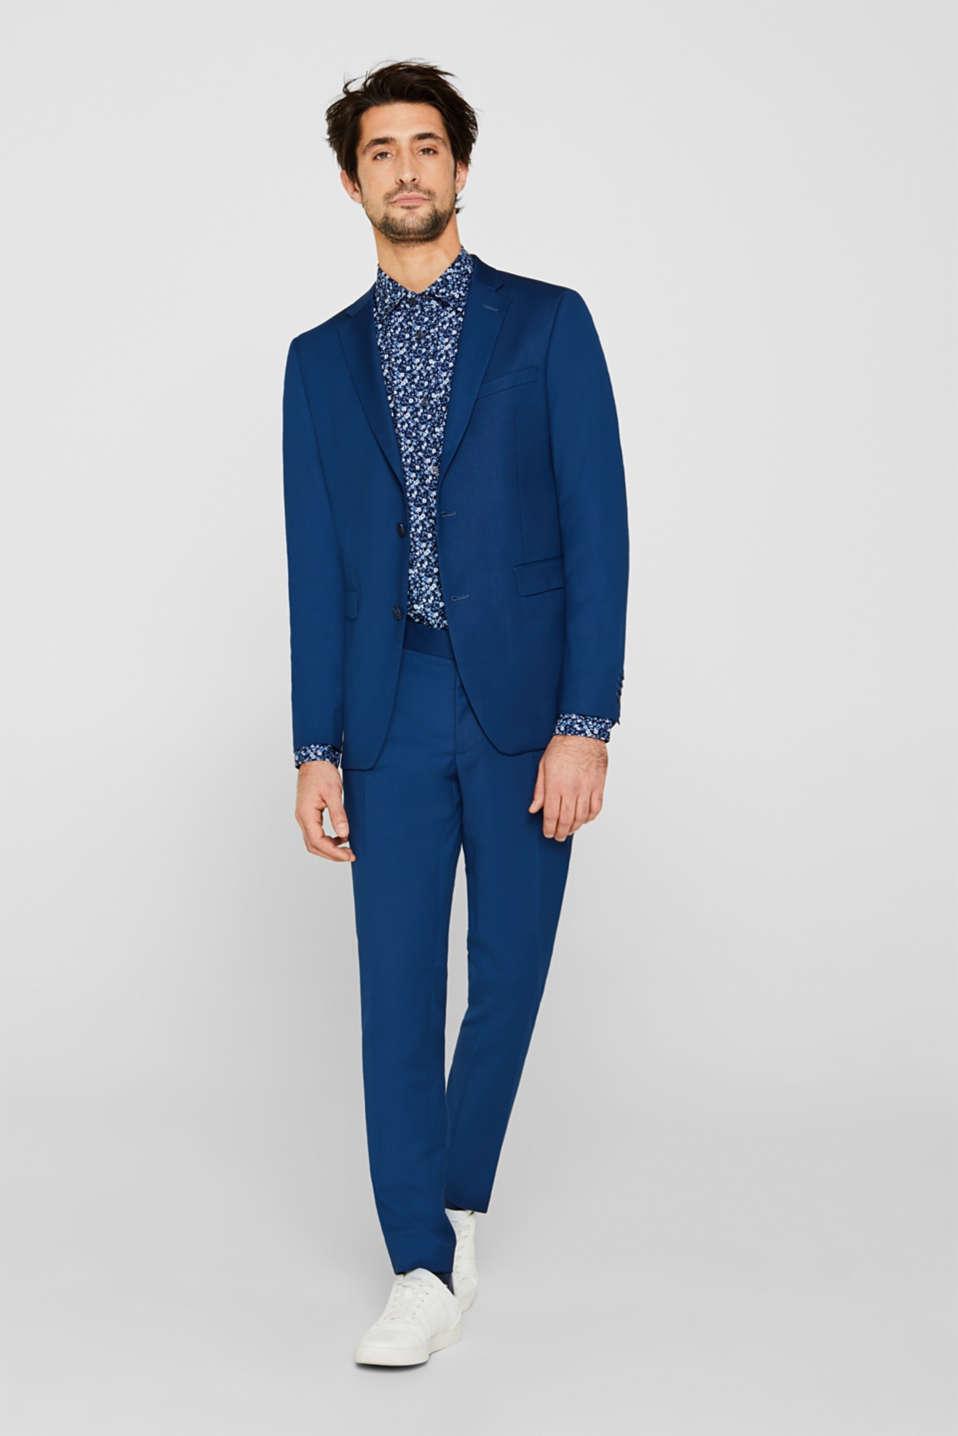 Premium shirt with a floral print, 100% cotton, DARK BLUE 4, detail image number 1